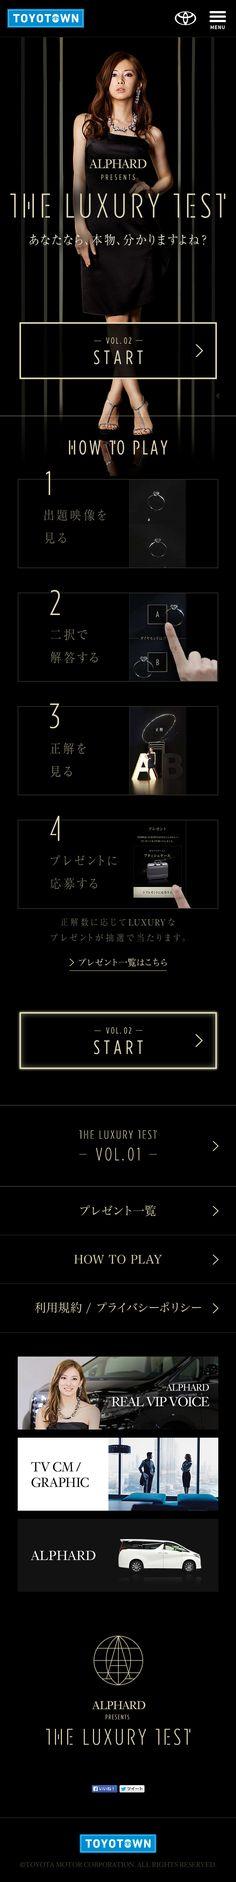 THE LUXURY TEST - TOYOTOWN Site Design, App Design, Layout Design, Web Japan, Fashion Web Design, Mobile Ui Design, Best Ads, Mobile Web, Article Design